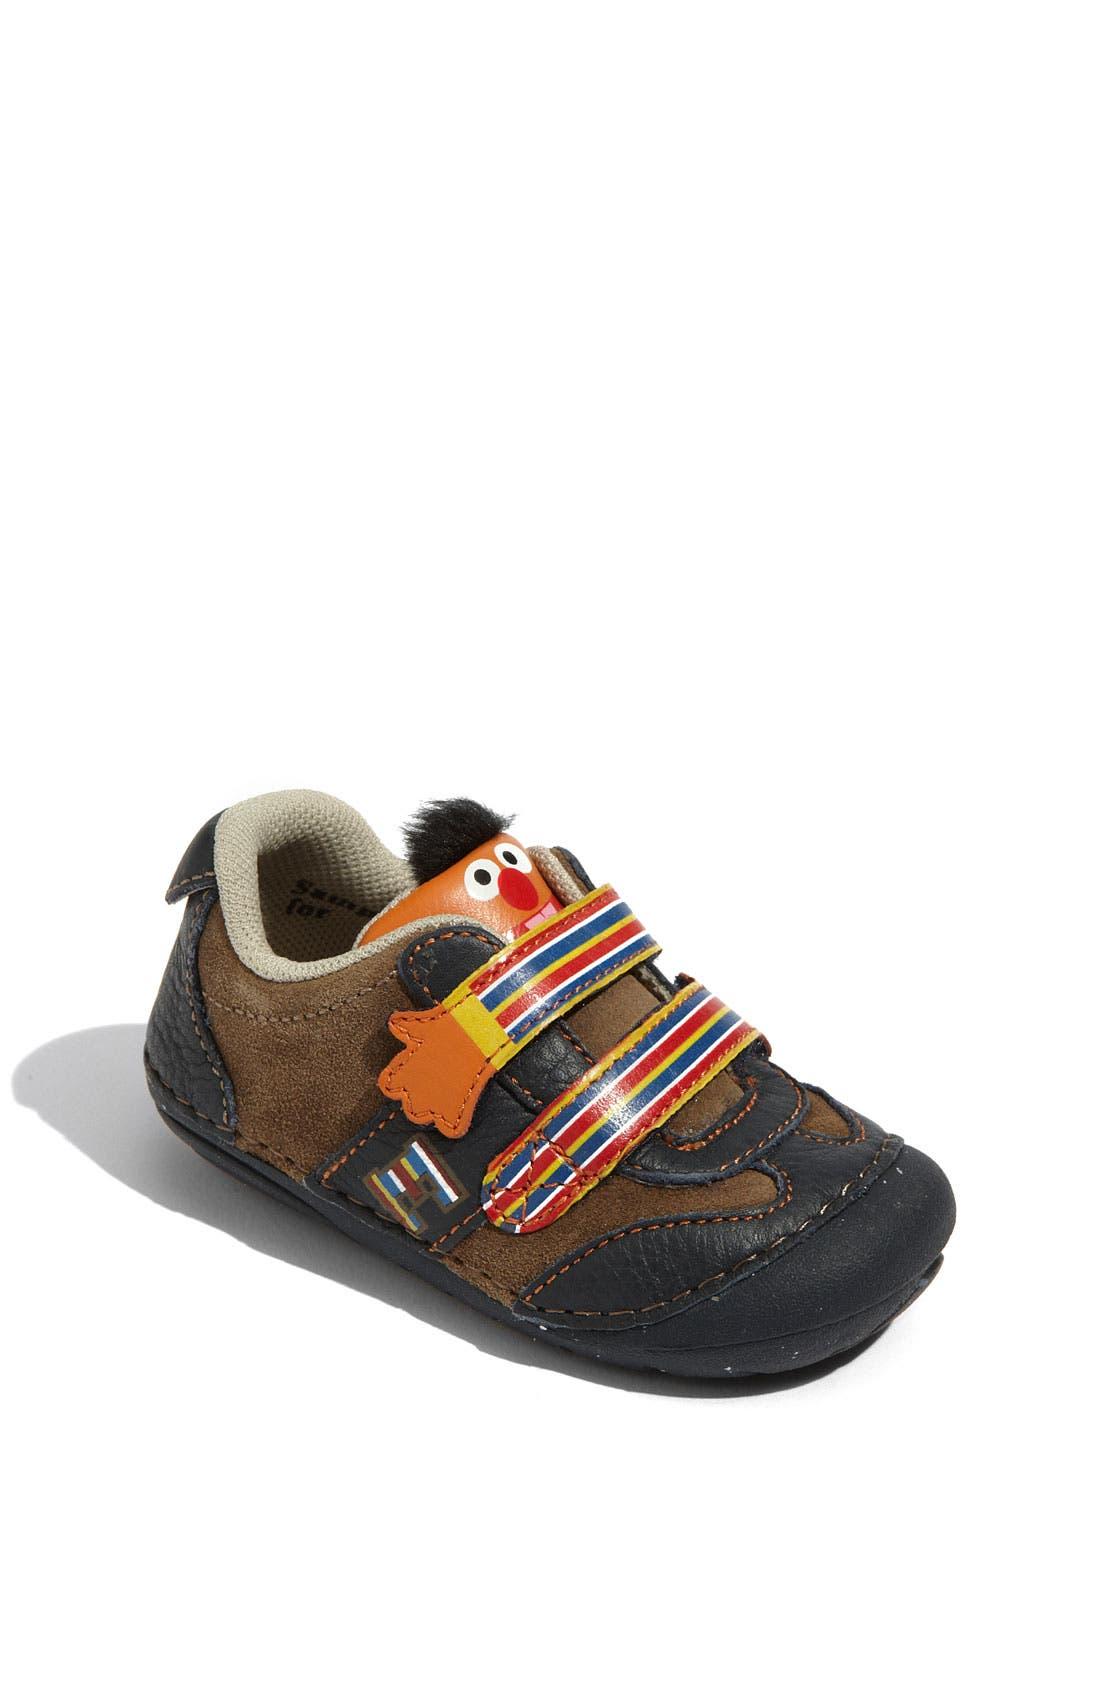 Alternate Image 1 Selected - Stride Rite 'Sesame Street® - Ernie' Sneaker (Baby & Walker)